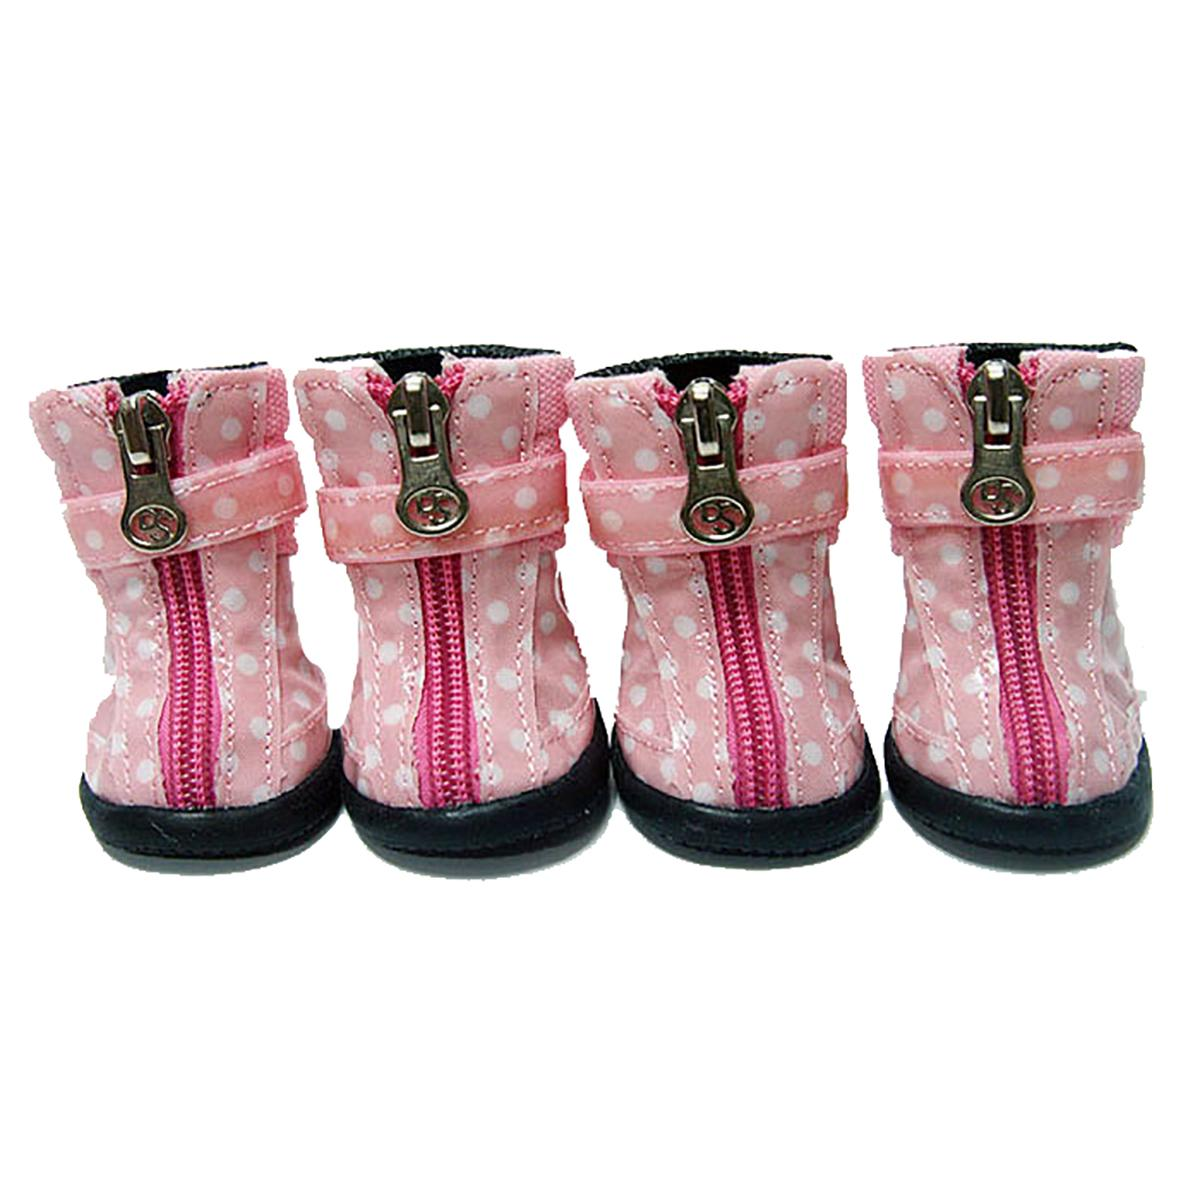 Polka Dot Hiker Dog Boots - Light Pink